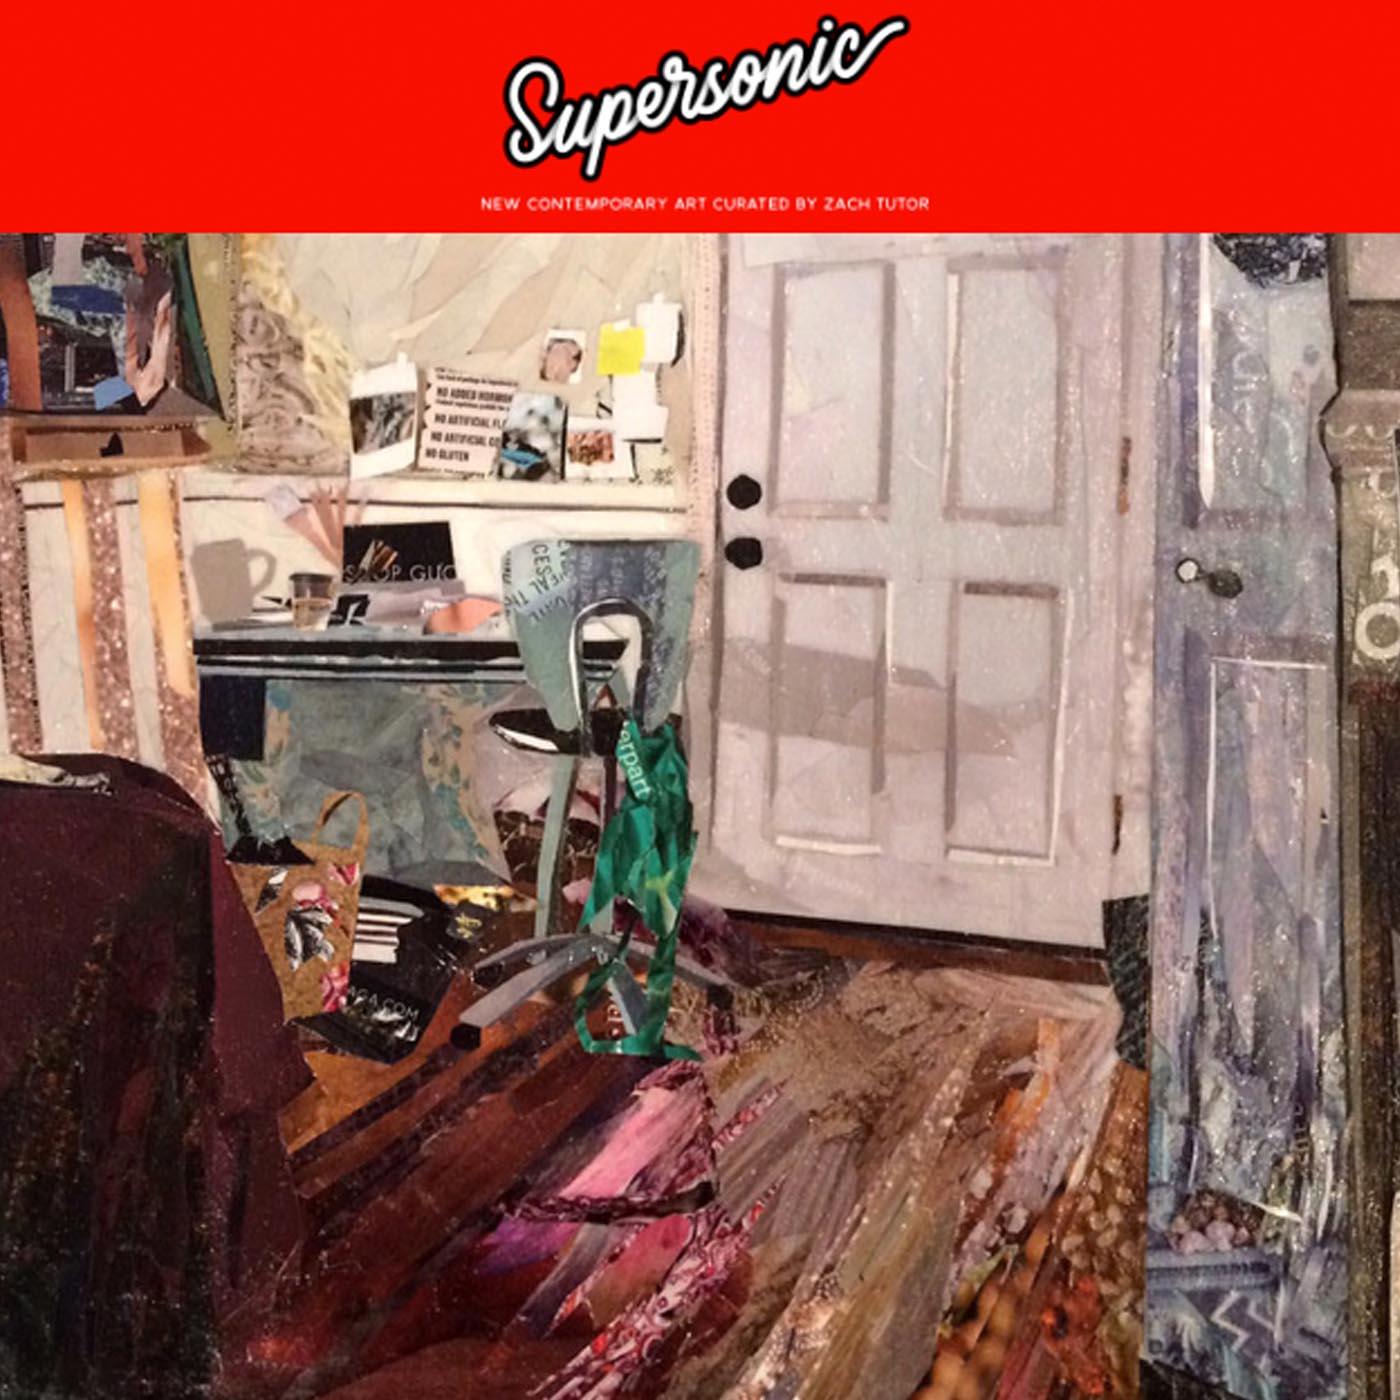 Supersonic Blog